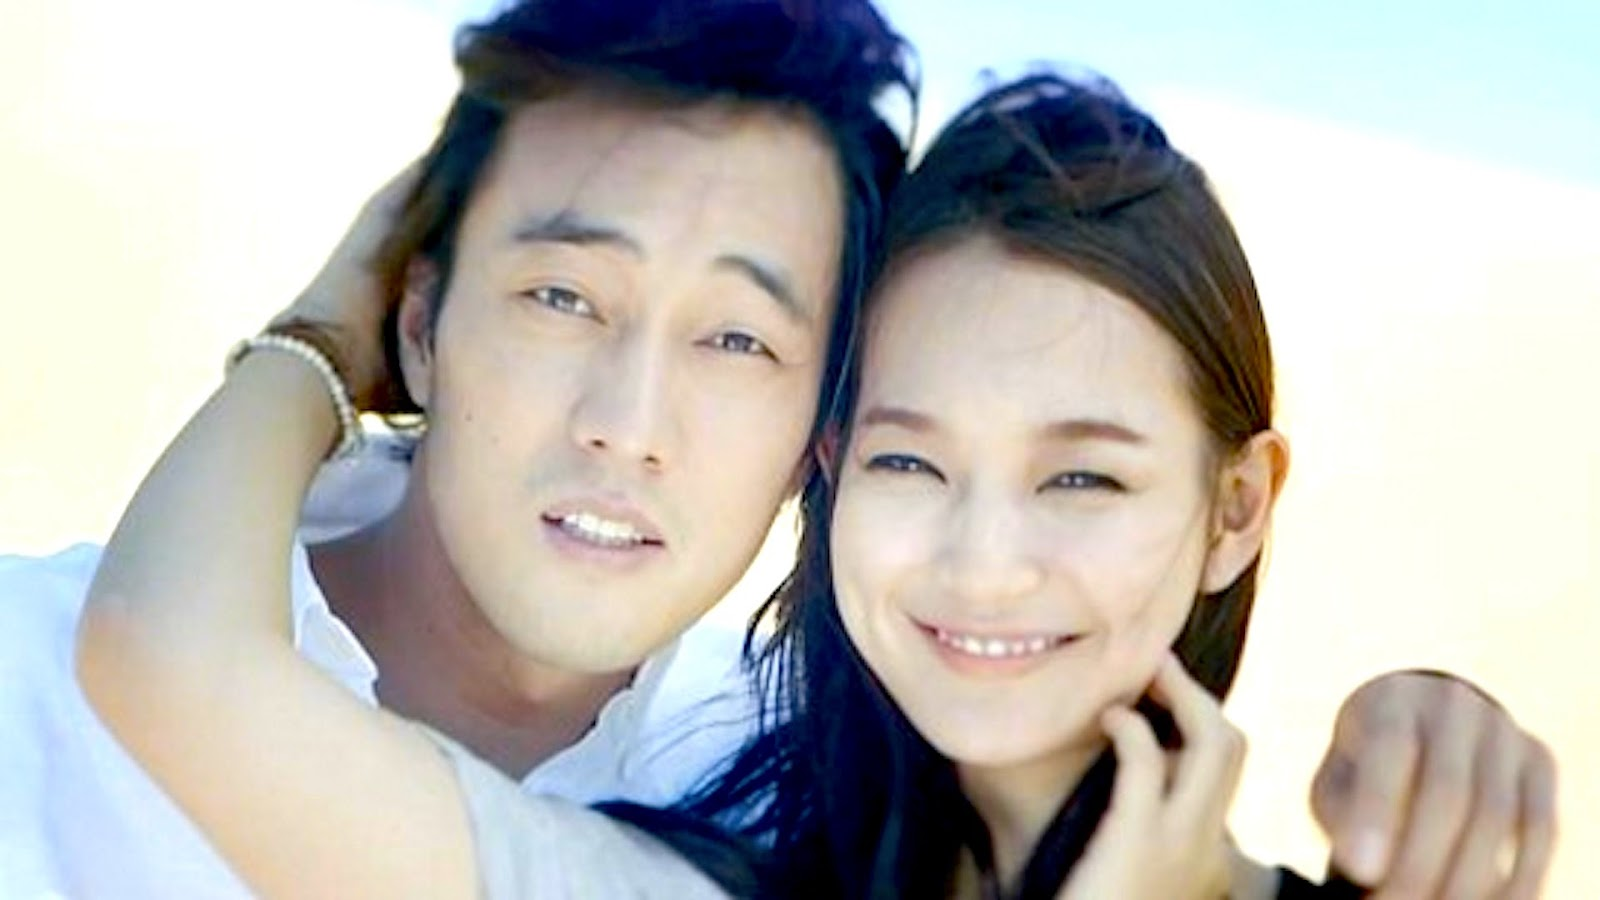 Style korean drama ep 2 eng sub - Need for speed movie apache